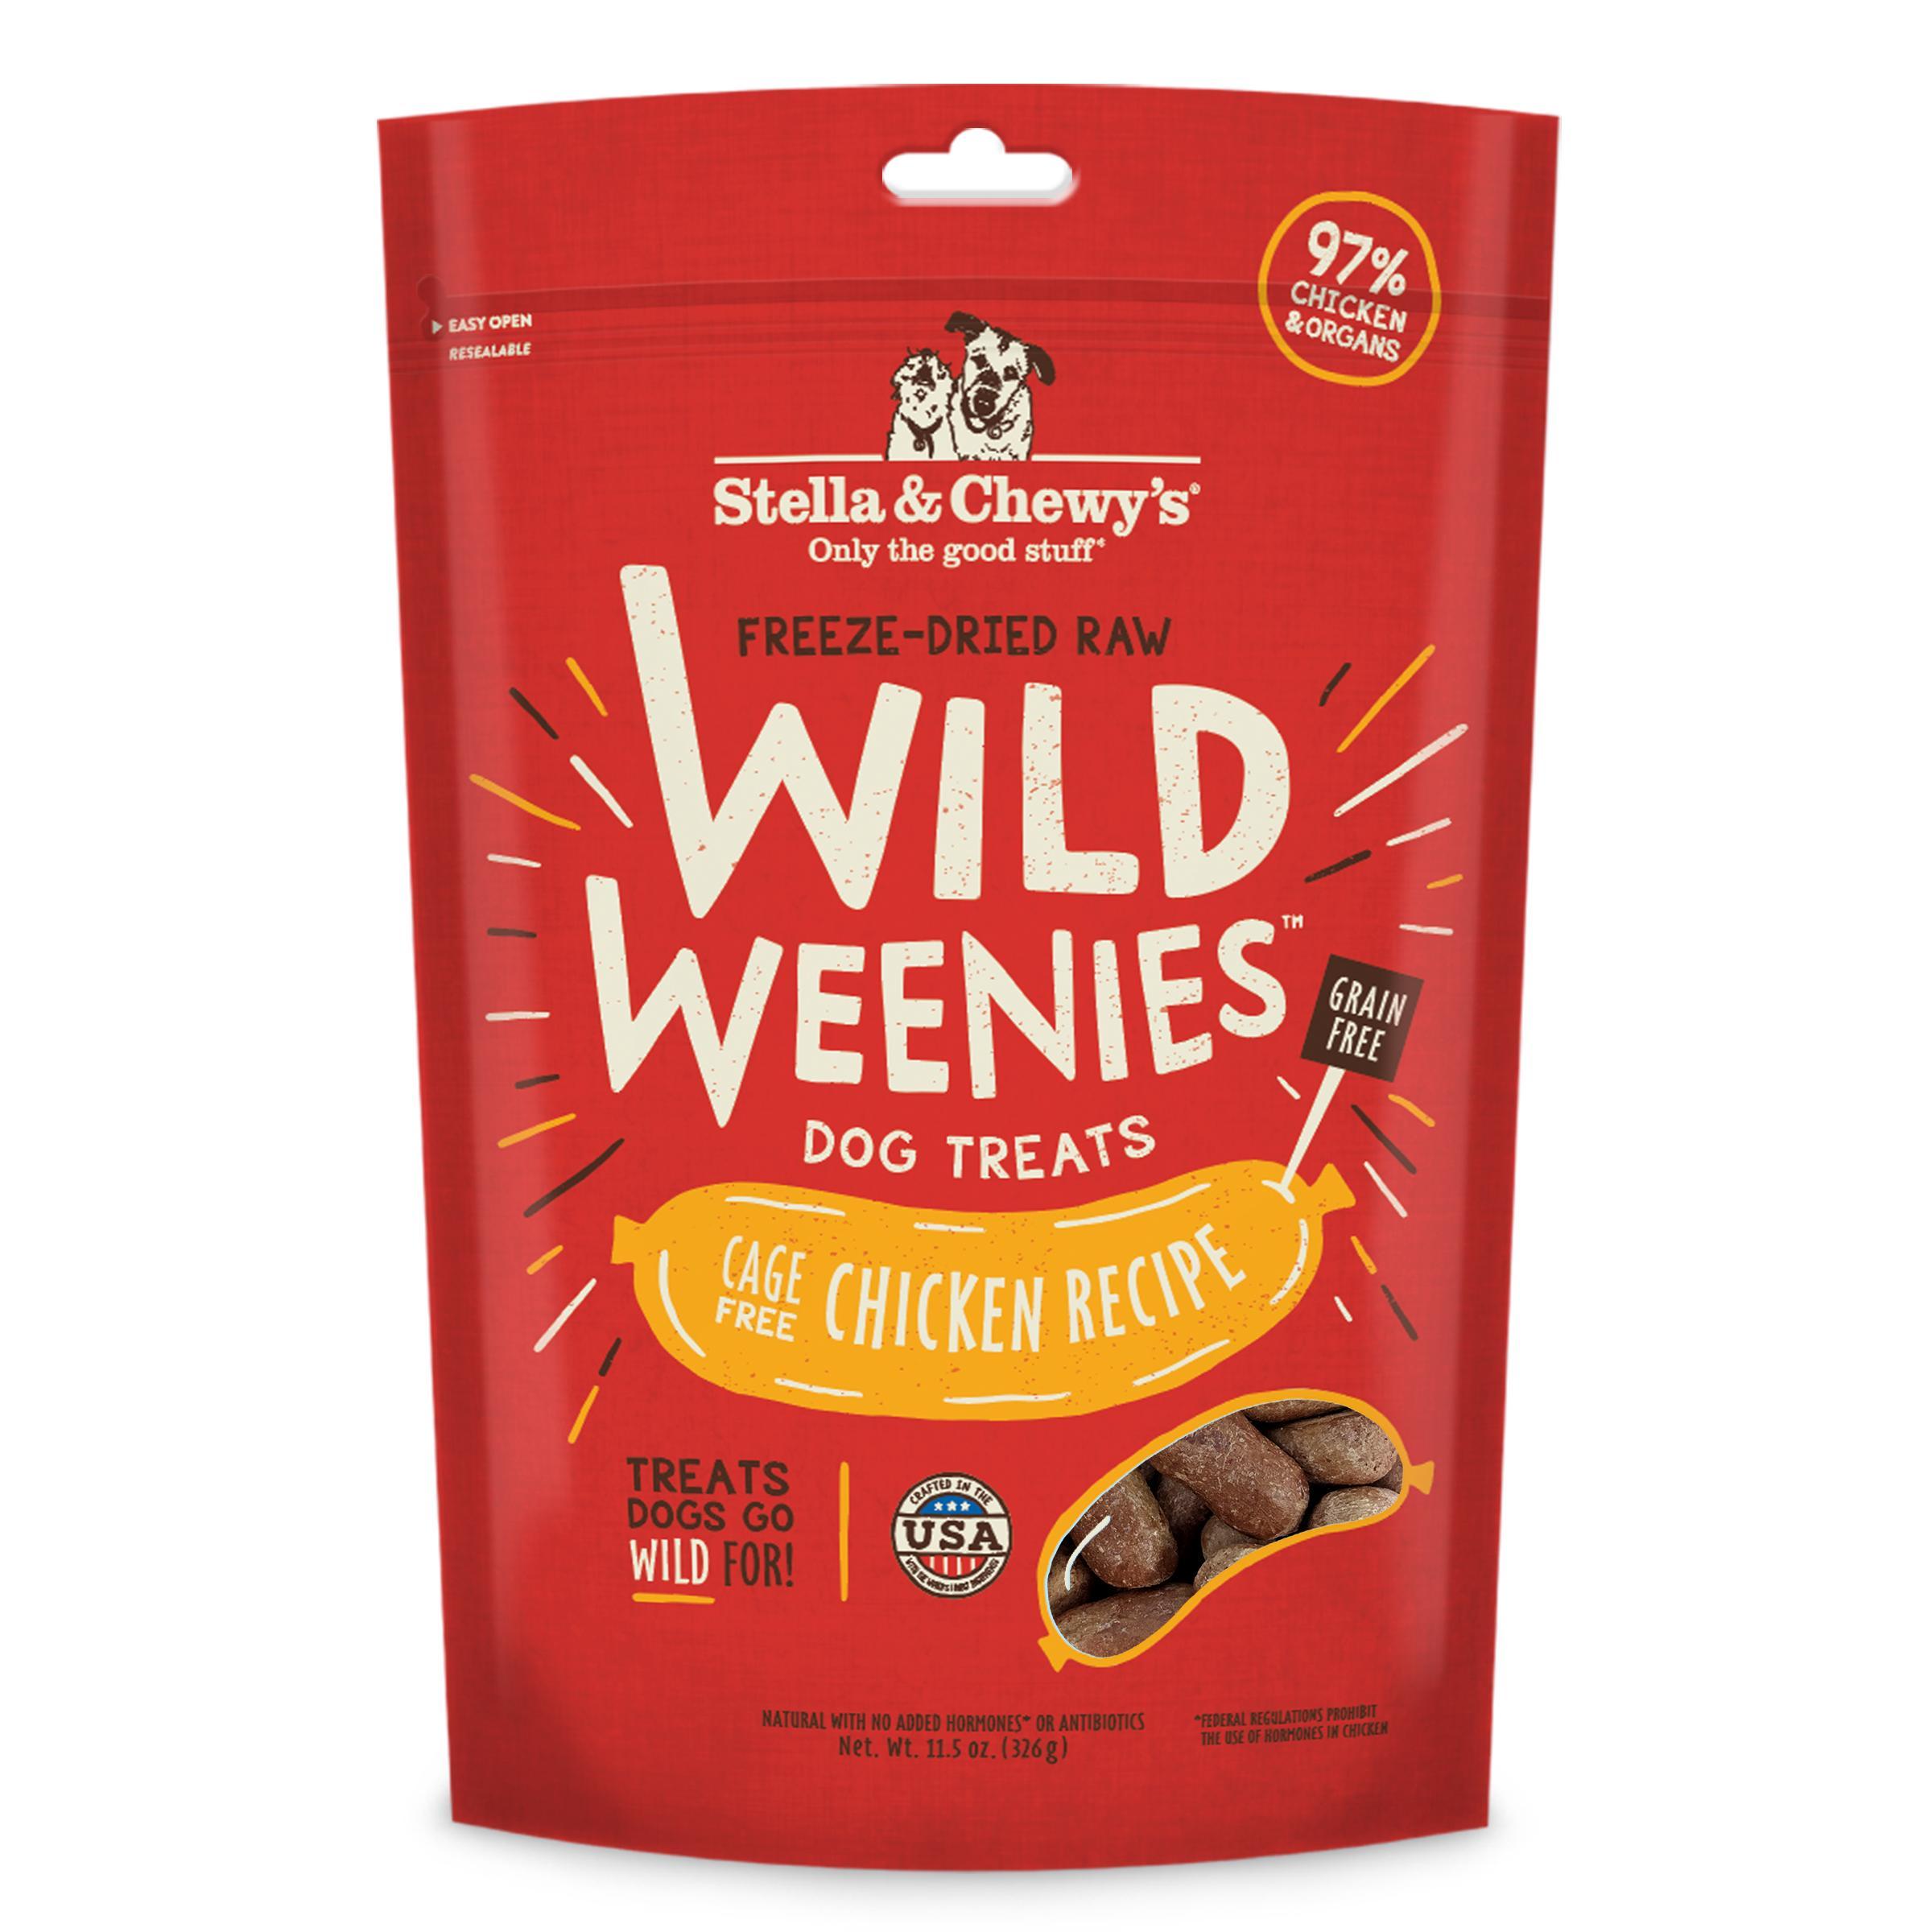 Stella & Chewy's Wild Weenies Cage-Free Chicken Recipe Freeze-Dried Dog Treats, 11.5-oz